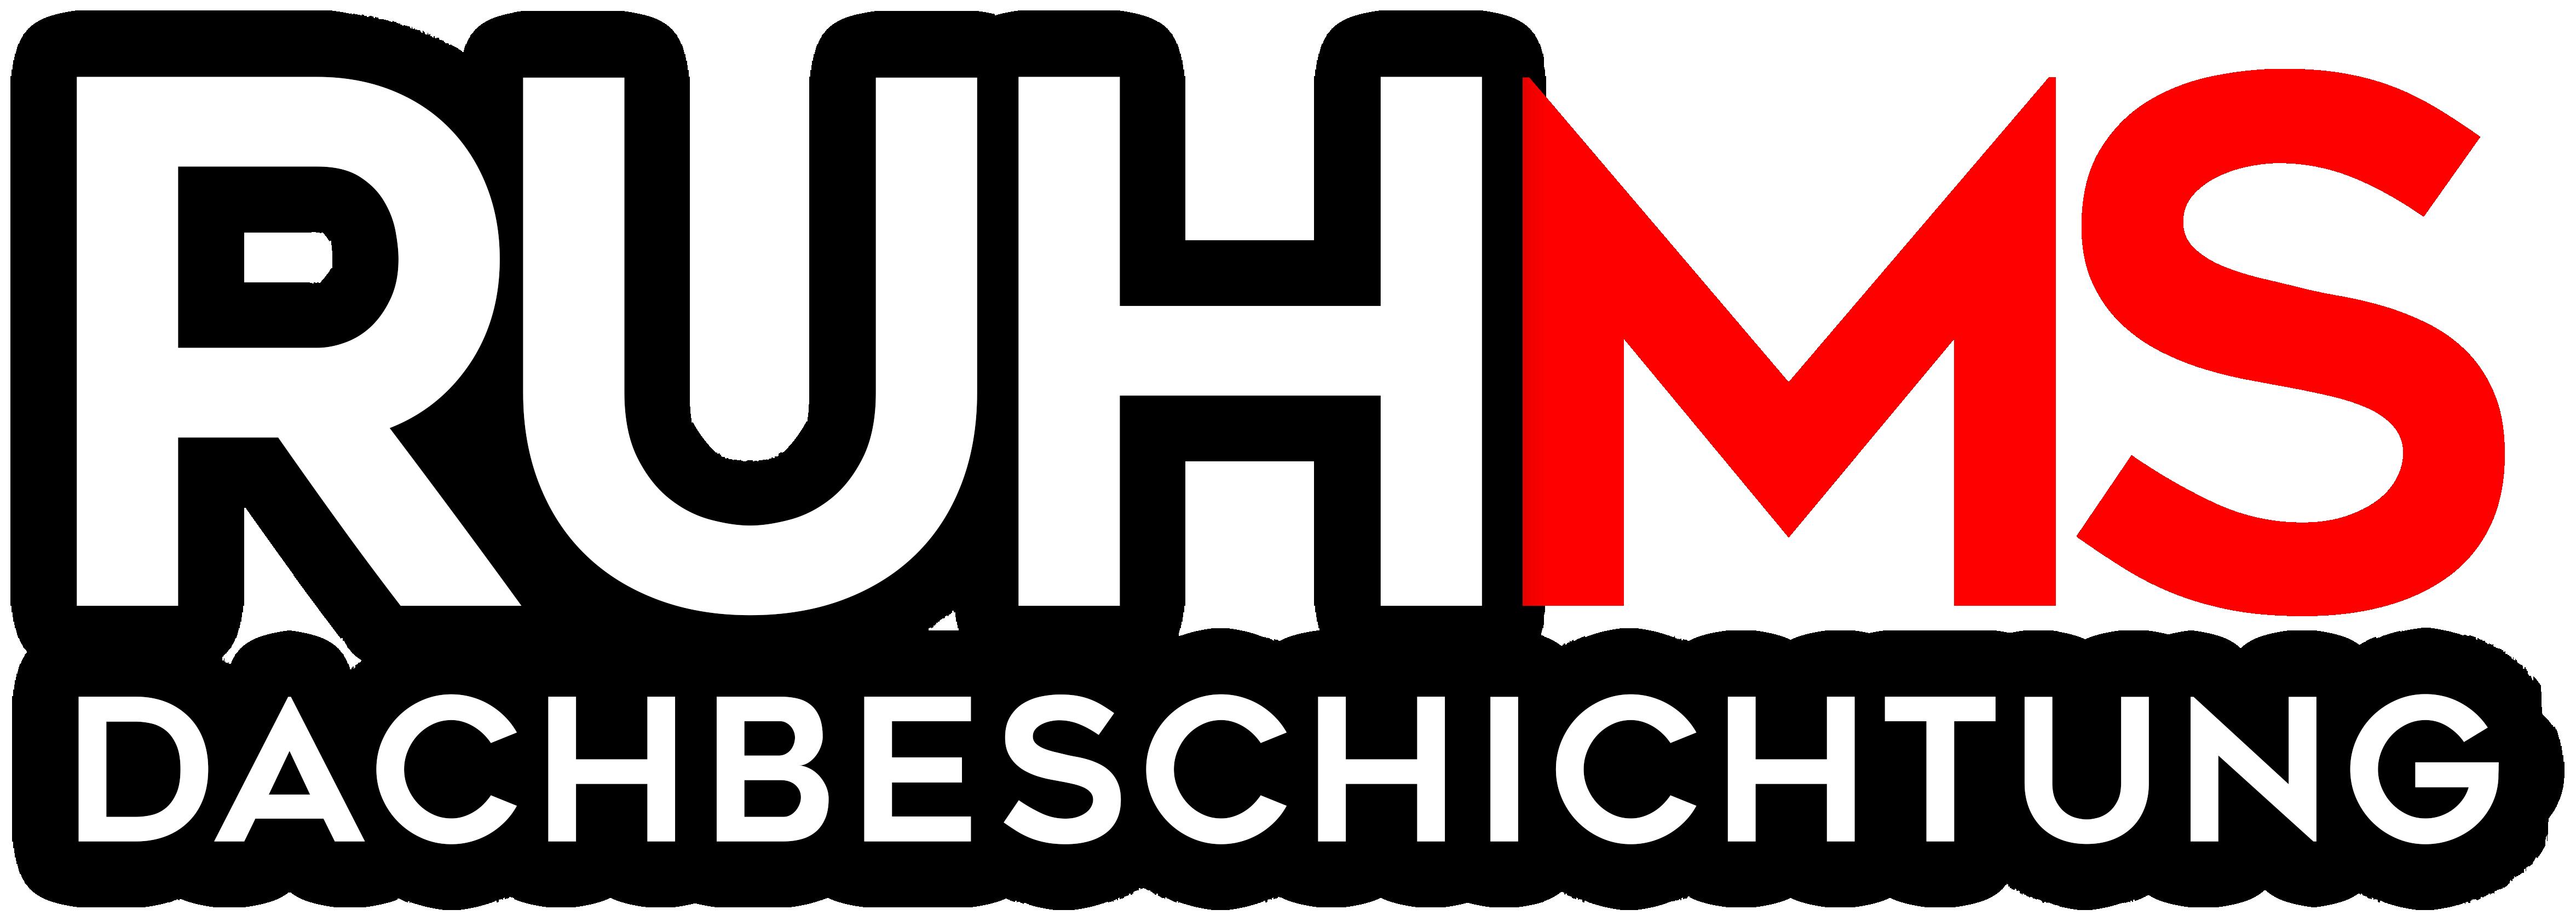 Dachbeschichtung RUHMS Spindler Dachreinigung